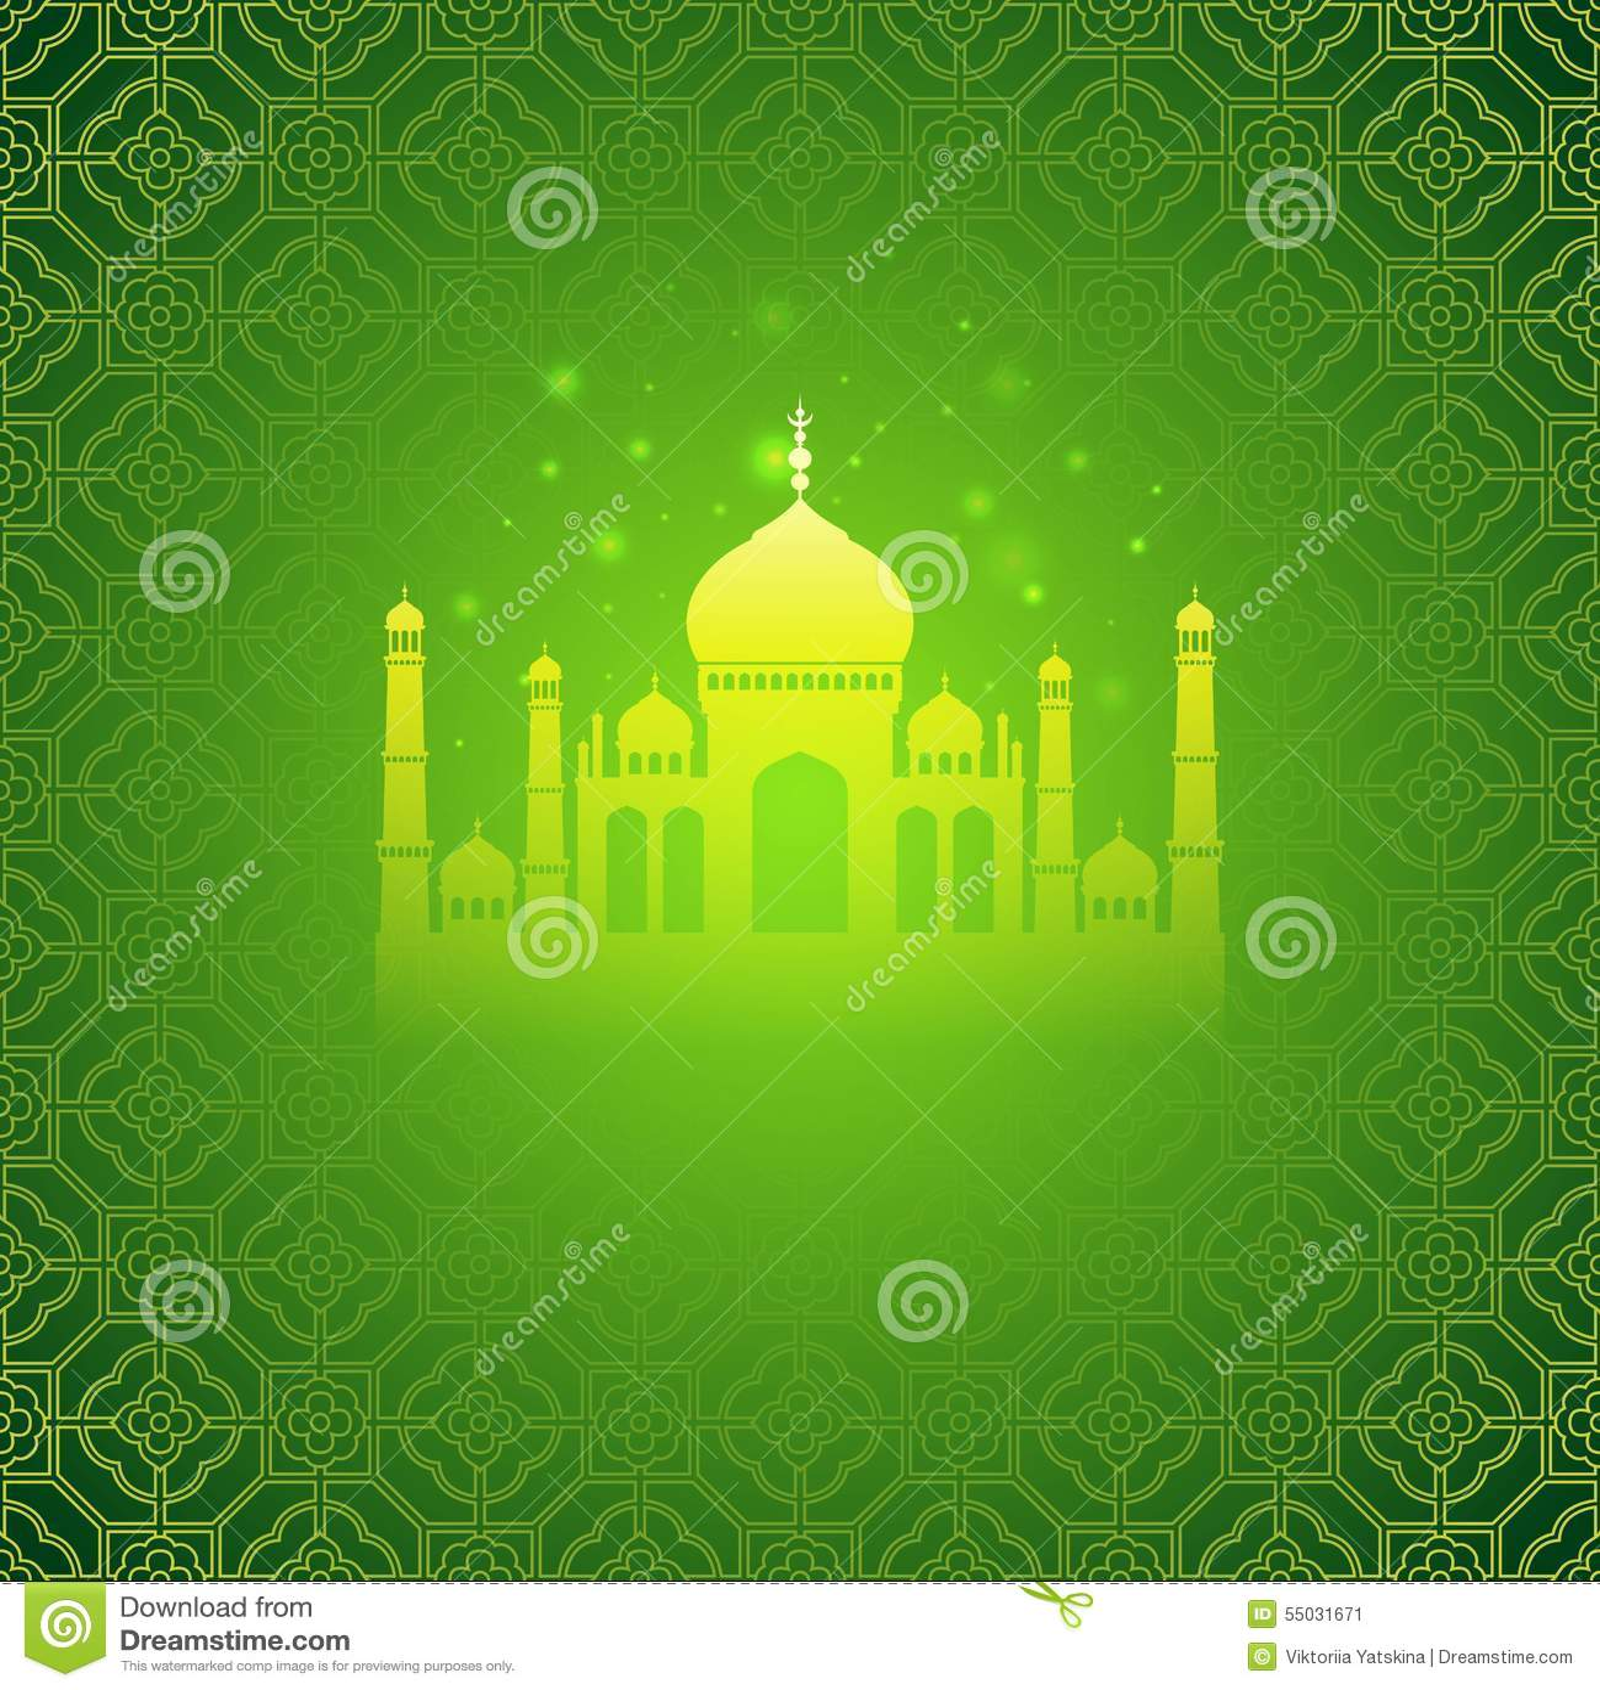 Ramadan greetings background ramadan kareem stock vector ramadan greetings background ramadan kareem heritage mubarak kristyandbryce Images